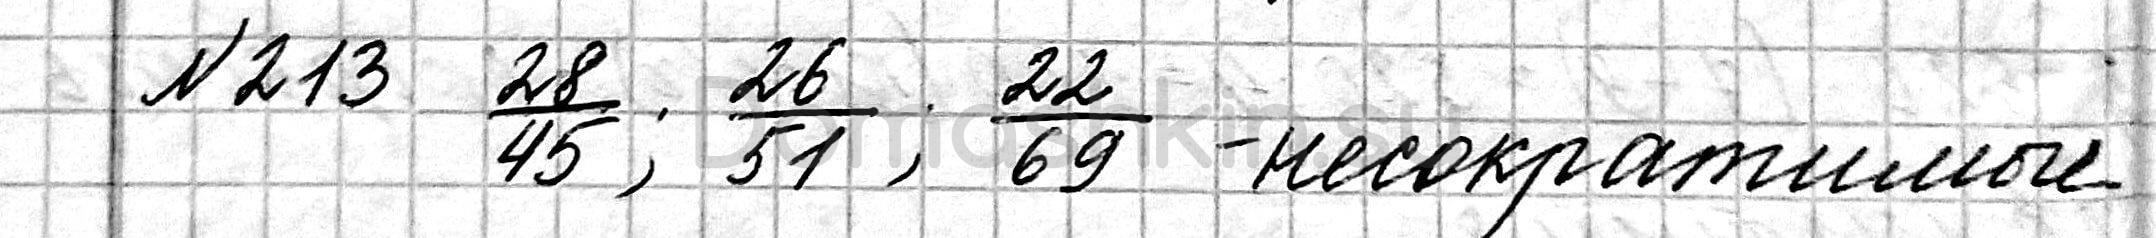 Математика 6 класс учебник Мерзляк номер 213 решение